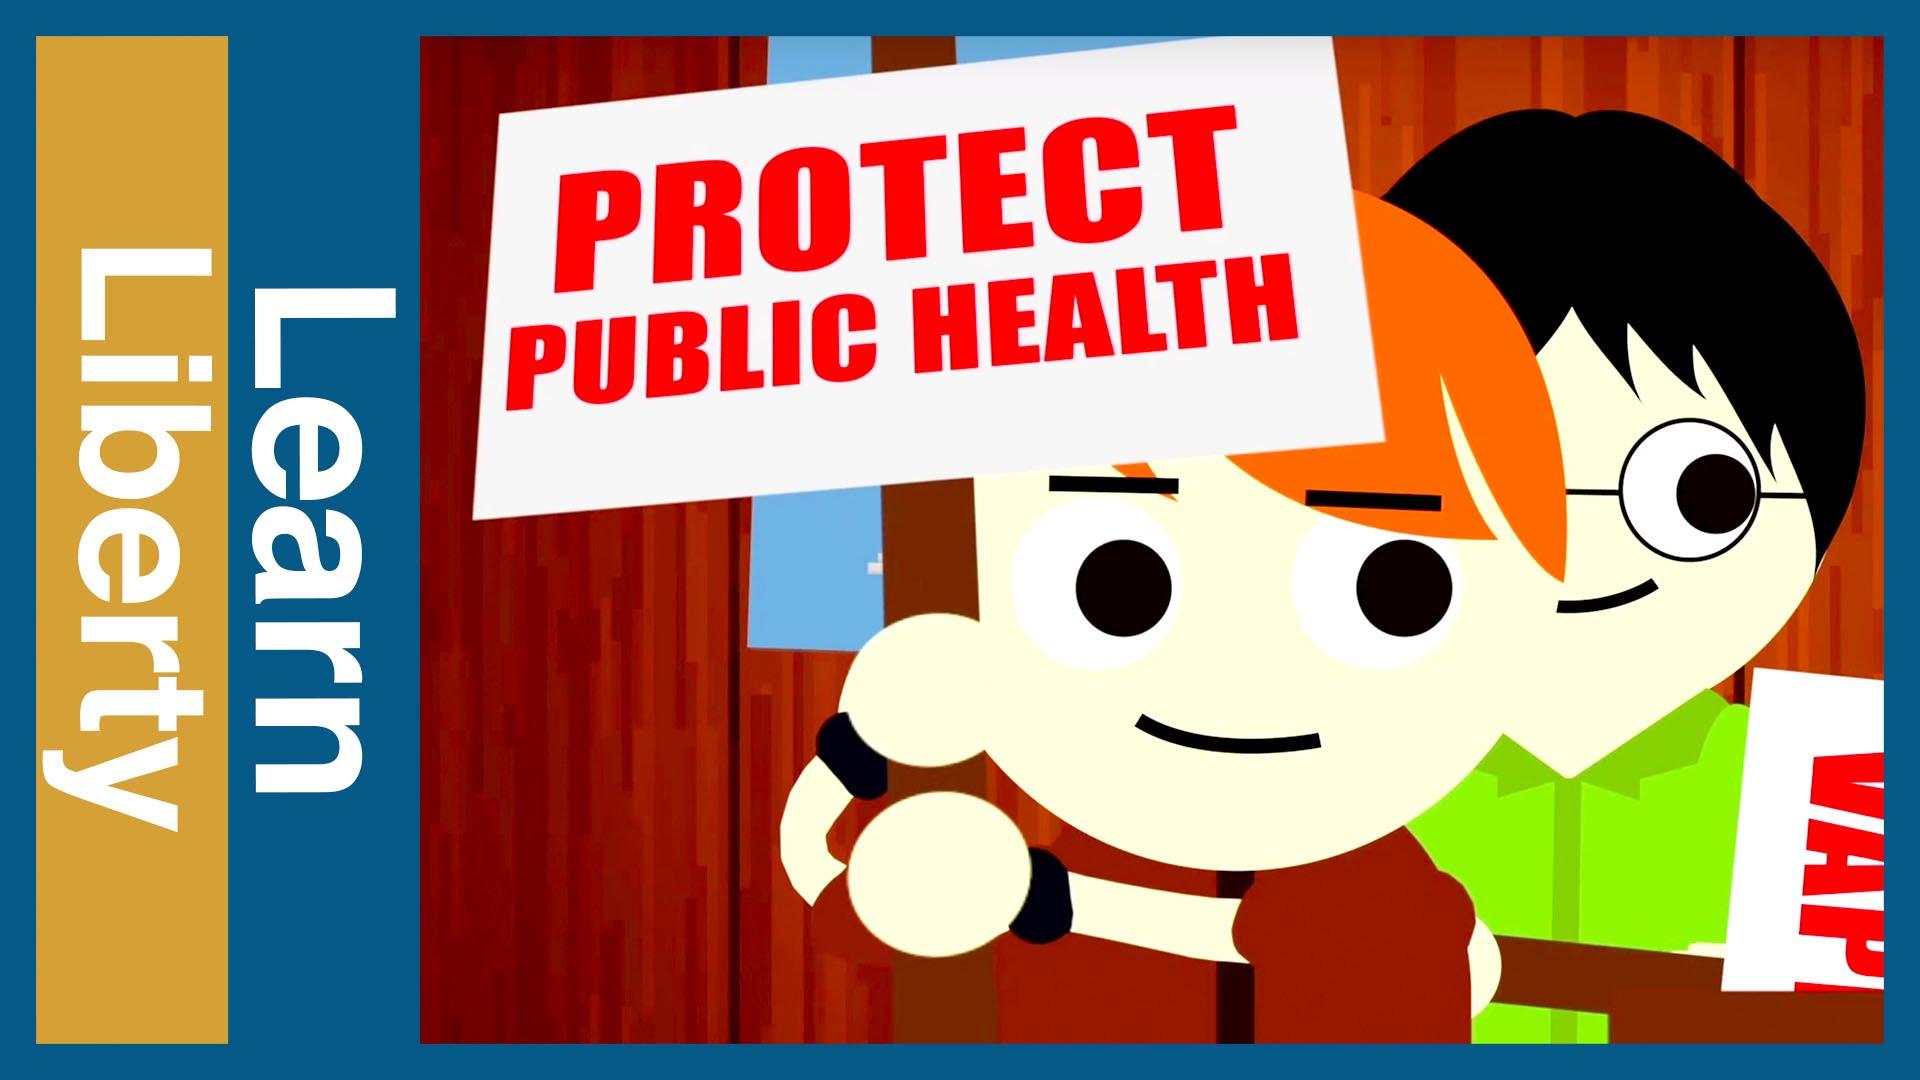 No Smoking clipart public health Companies Companies Smoking Public Tobacco